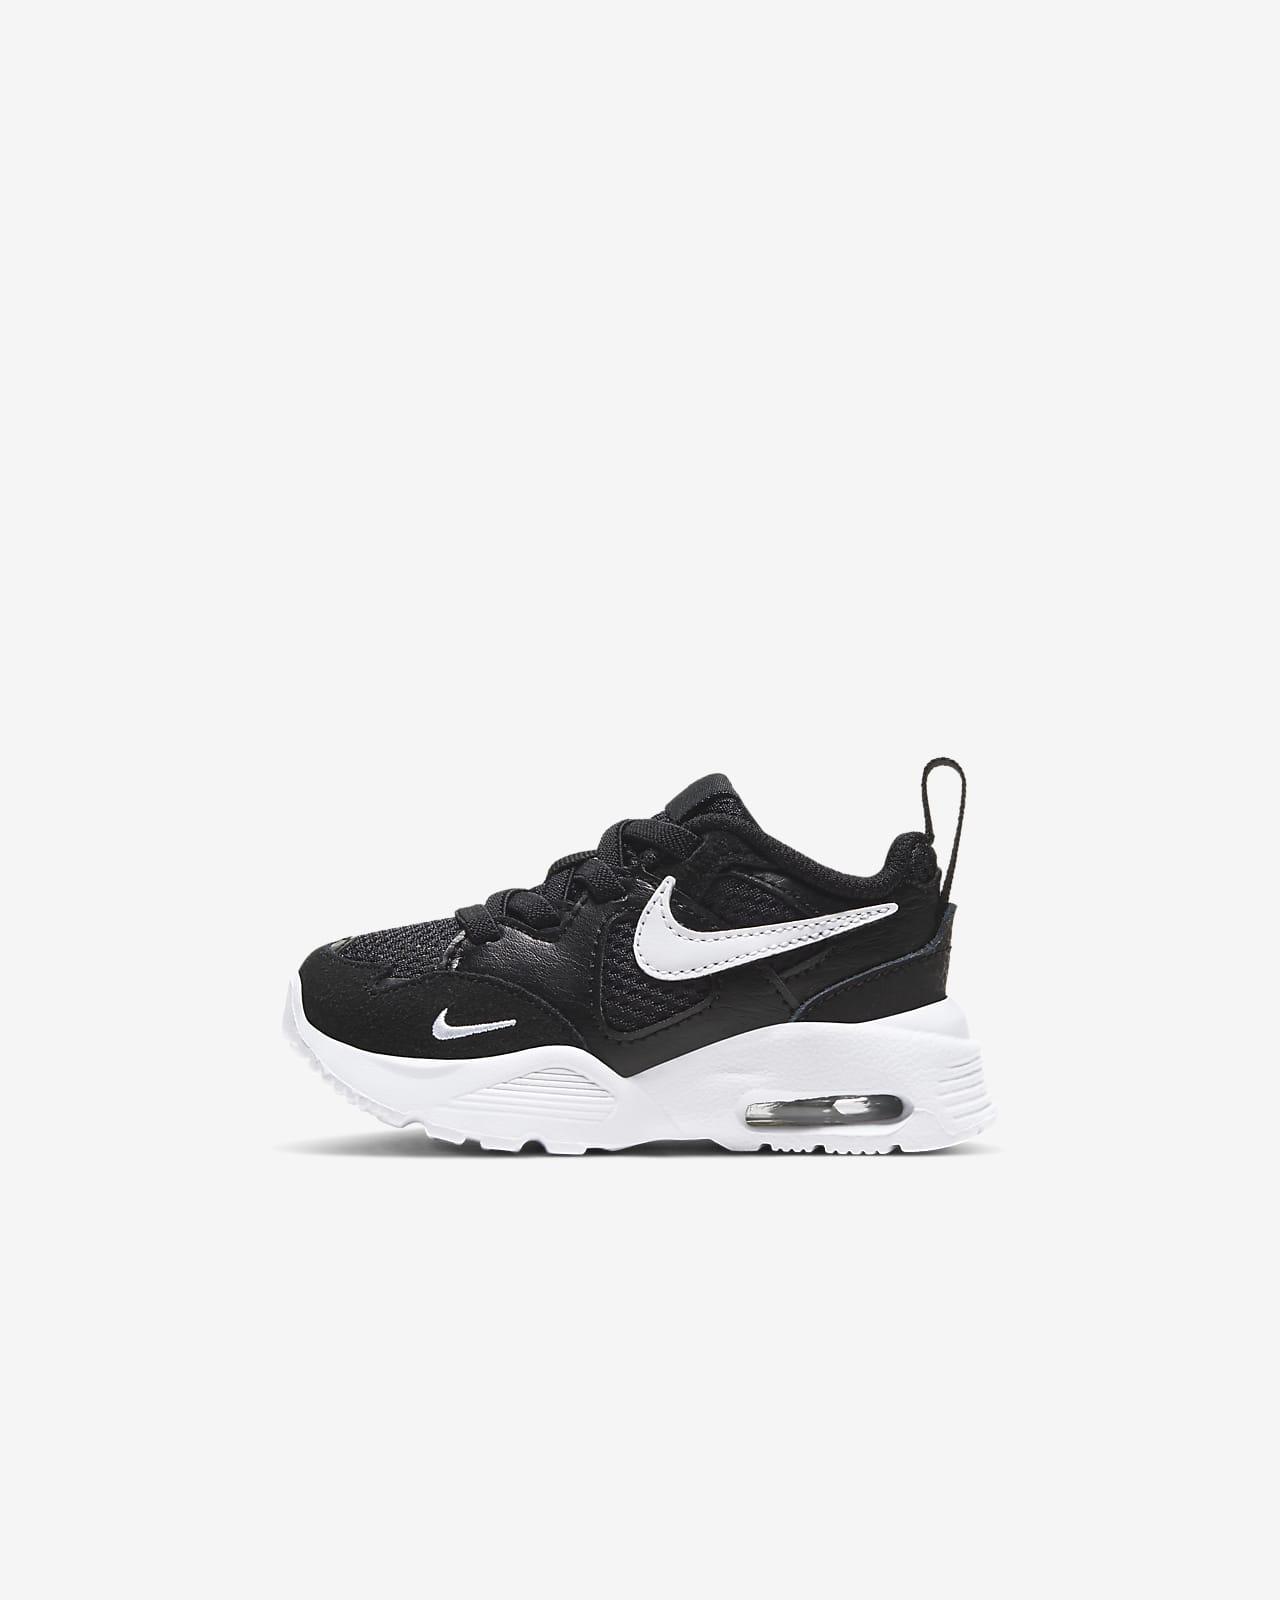 Nike Air Max Fusion Baby/Toddler Shoe